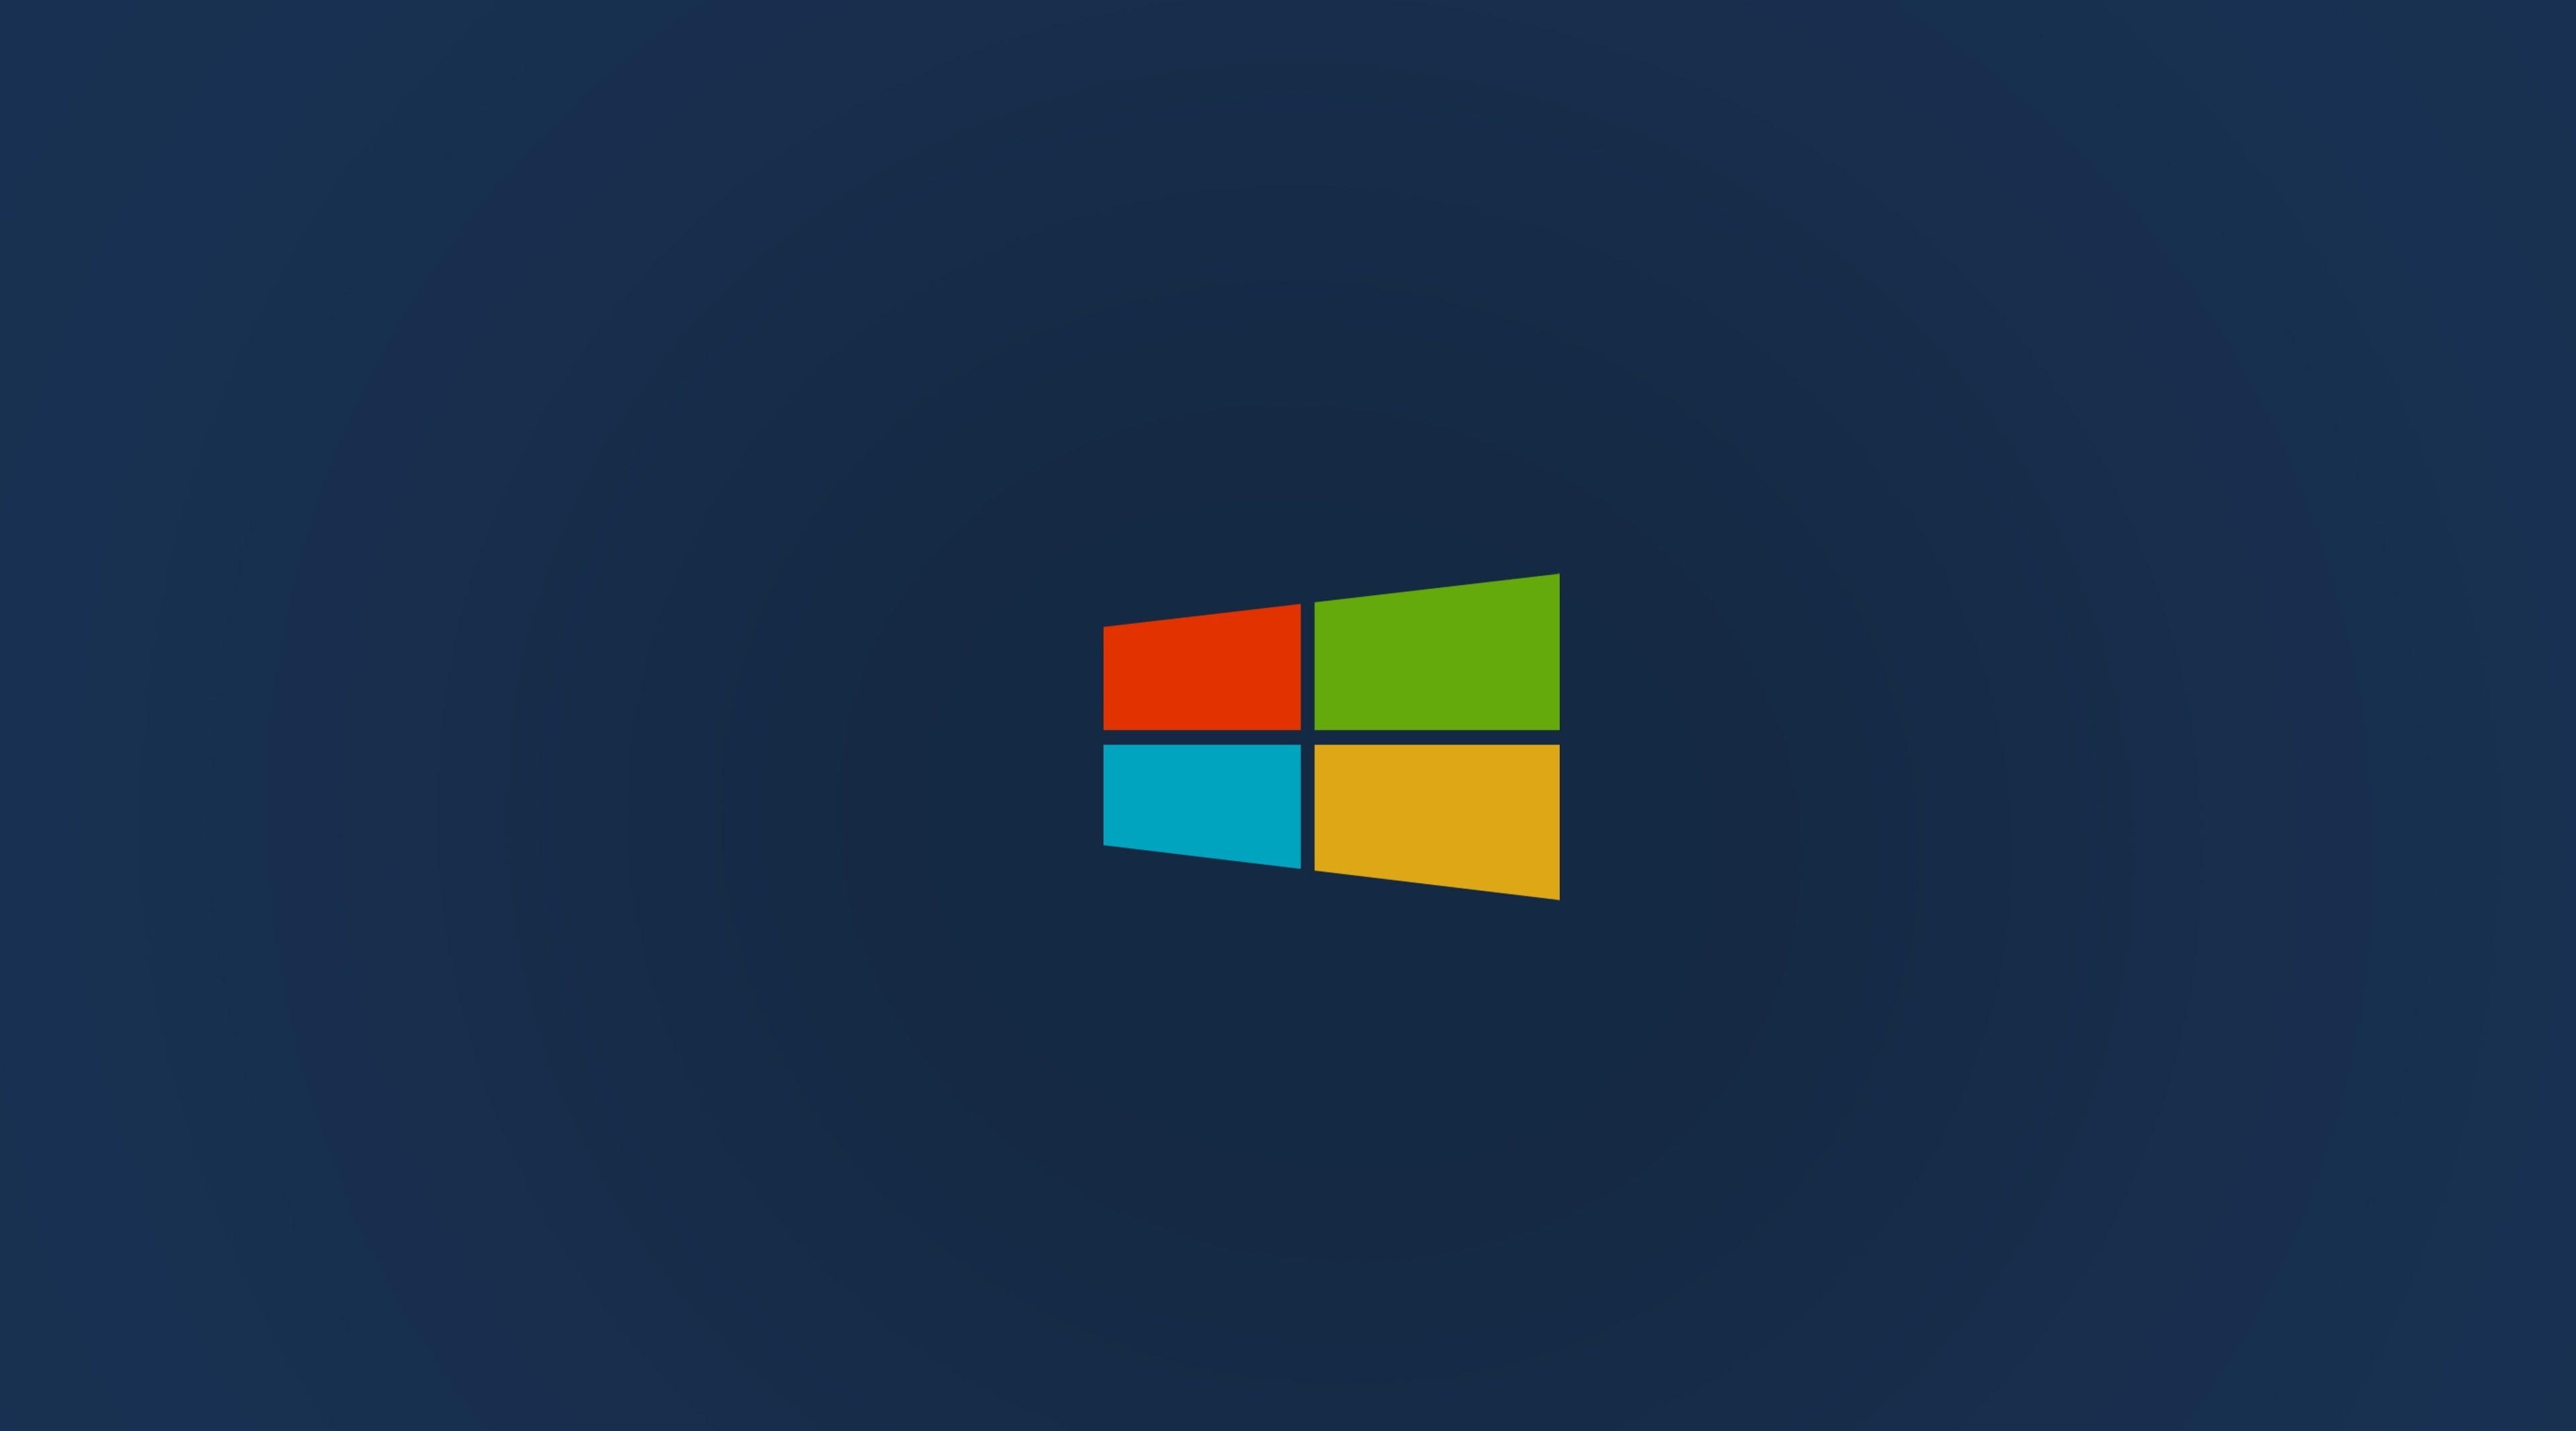 Windows 10 4k Windows Logo Windows Windows 10 4k Wallpaper Hdwallpaper Desktop Hd Wallpaper Desktop Wallpaper 1920x1080 Wallpaper